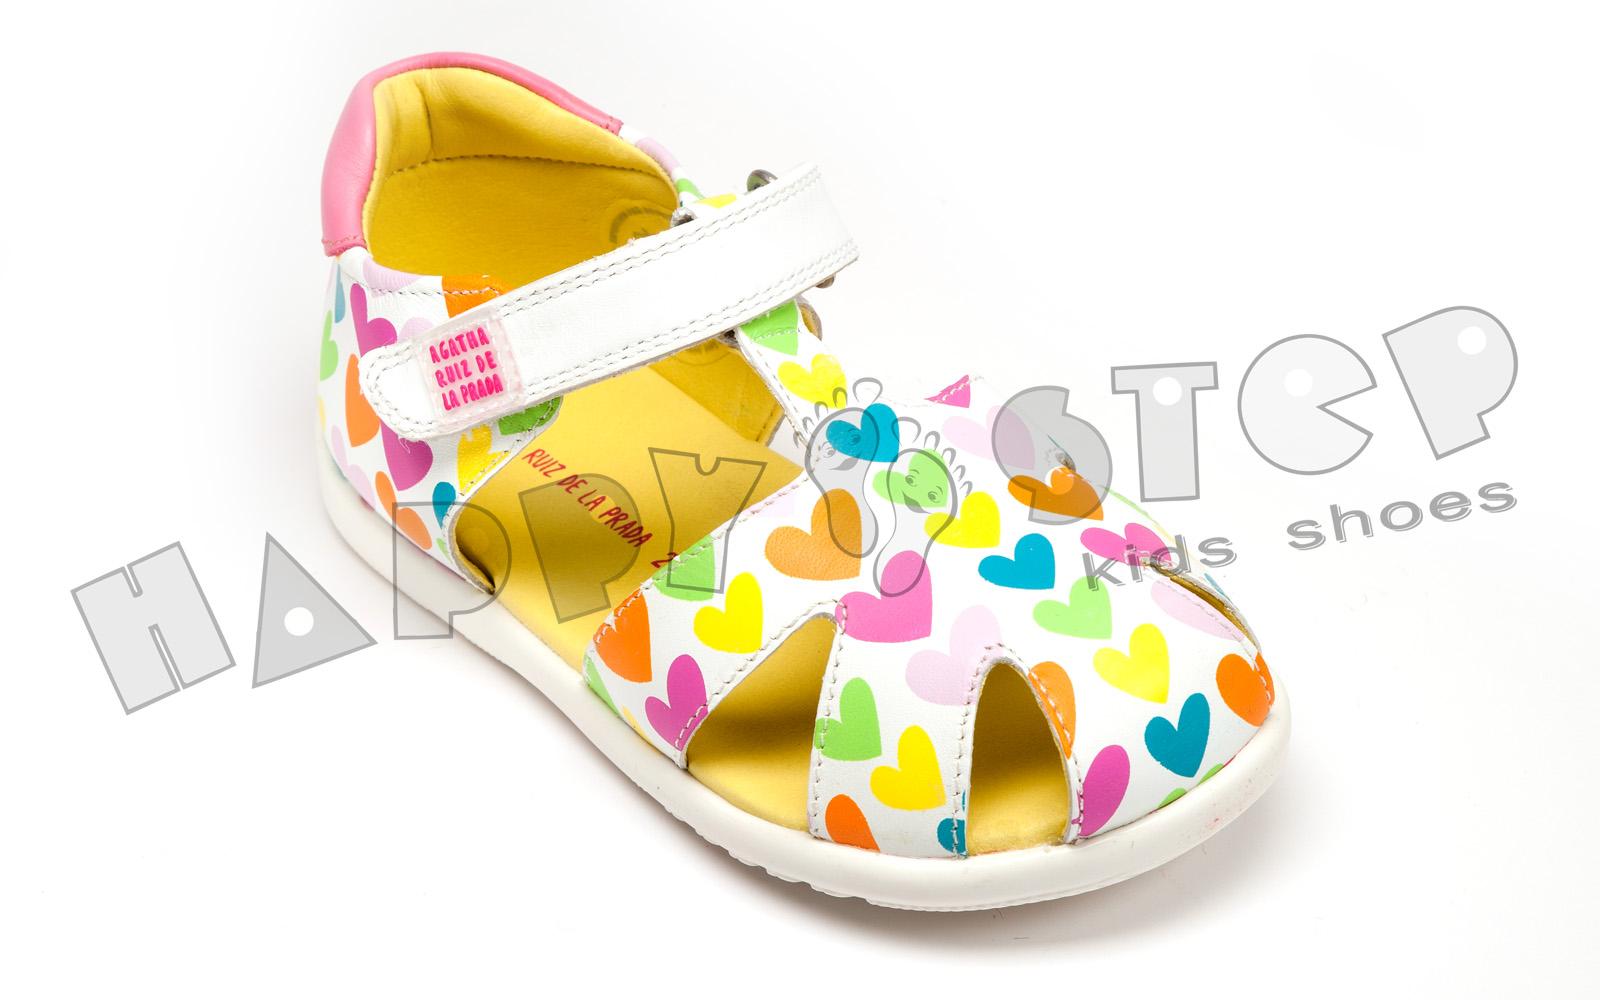 9c4038b1ac6 AGATHA RUIZ DE LA PRADA 192907 - Παιδικά παπούτσια Happy Step